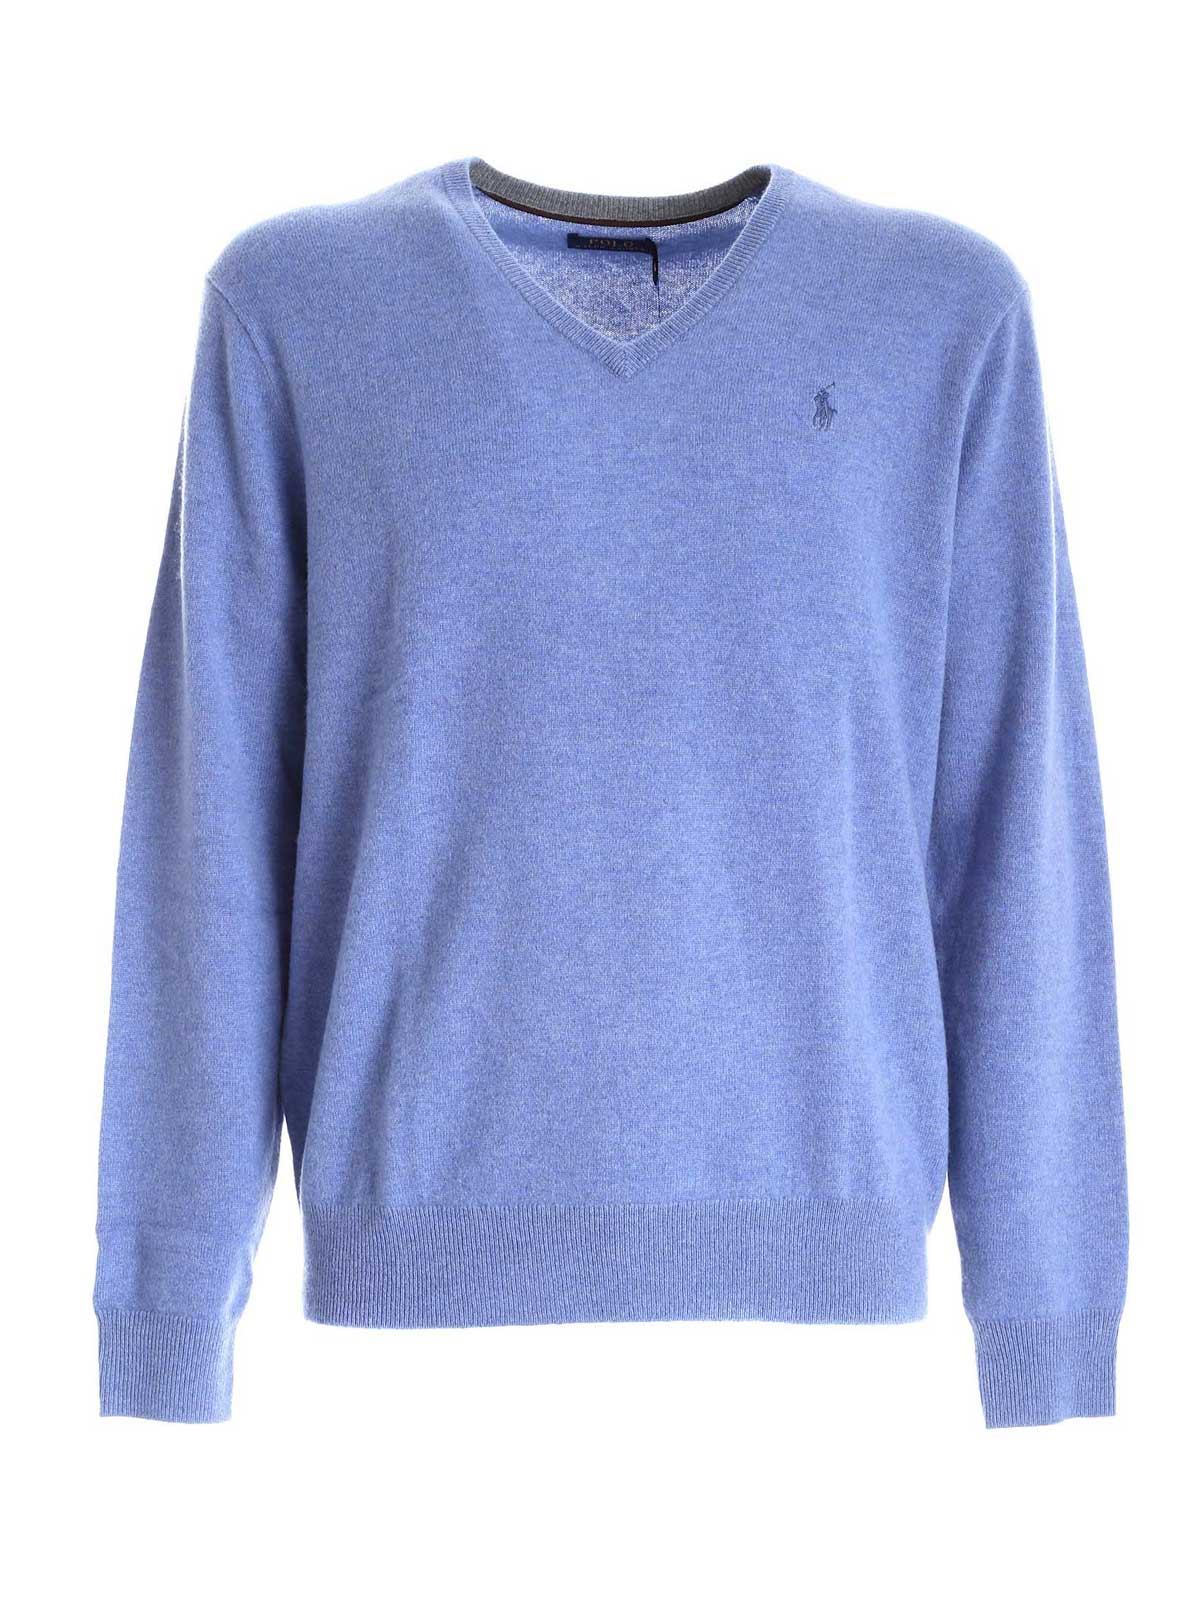 Picture of POLO RALPH LAUREN | Men's Merino V-Neck Sweater